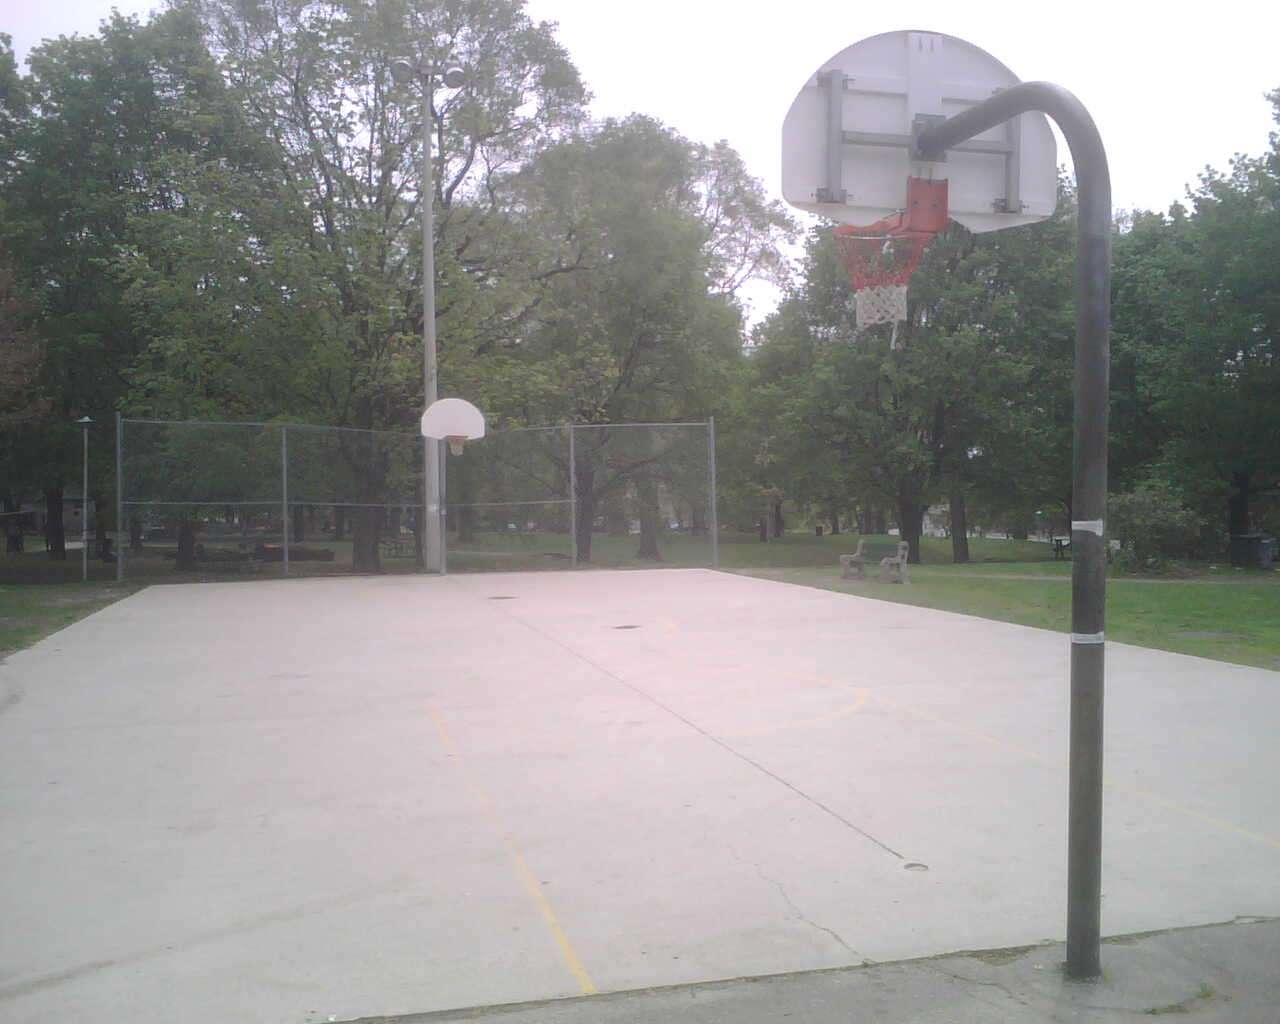 Toronto Basketball Court Dufferin Grove Courts Of The World